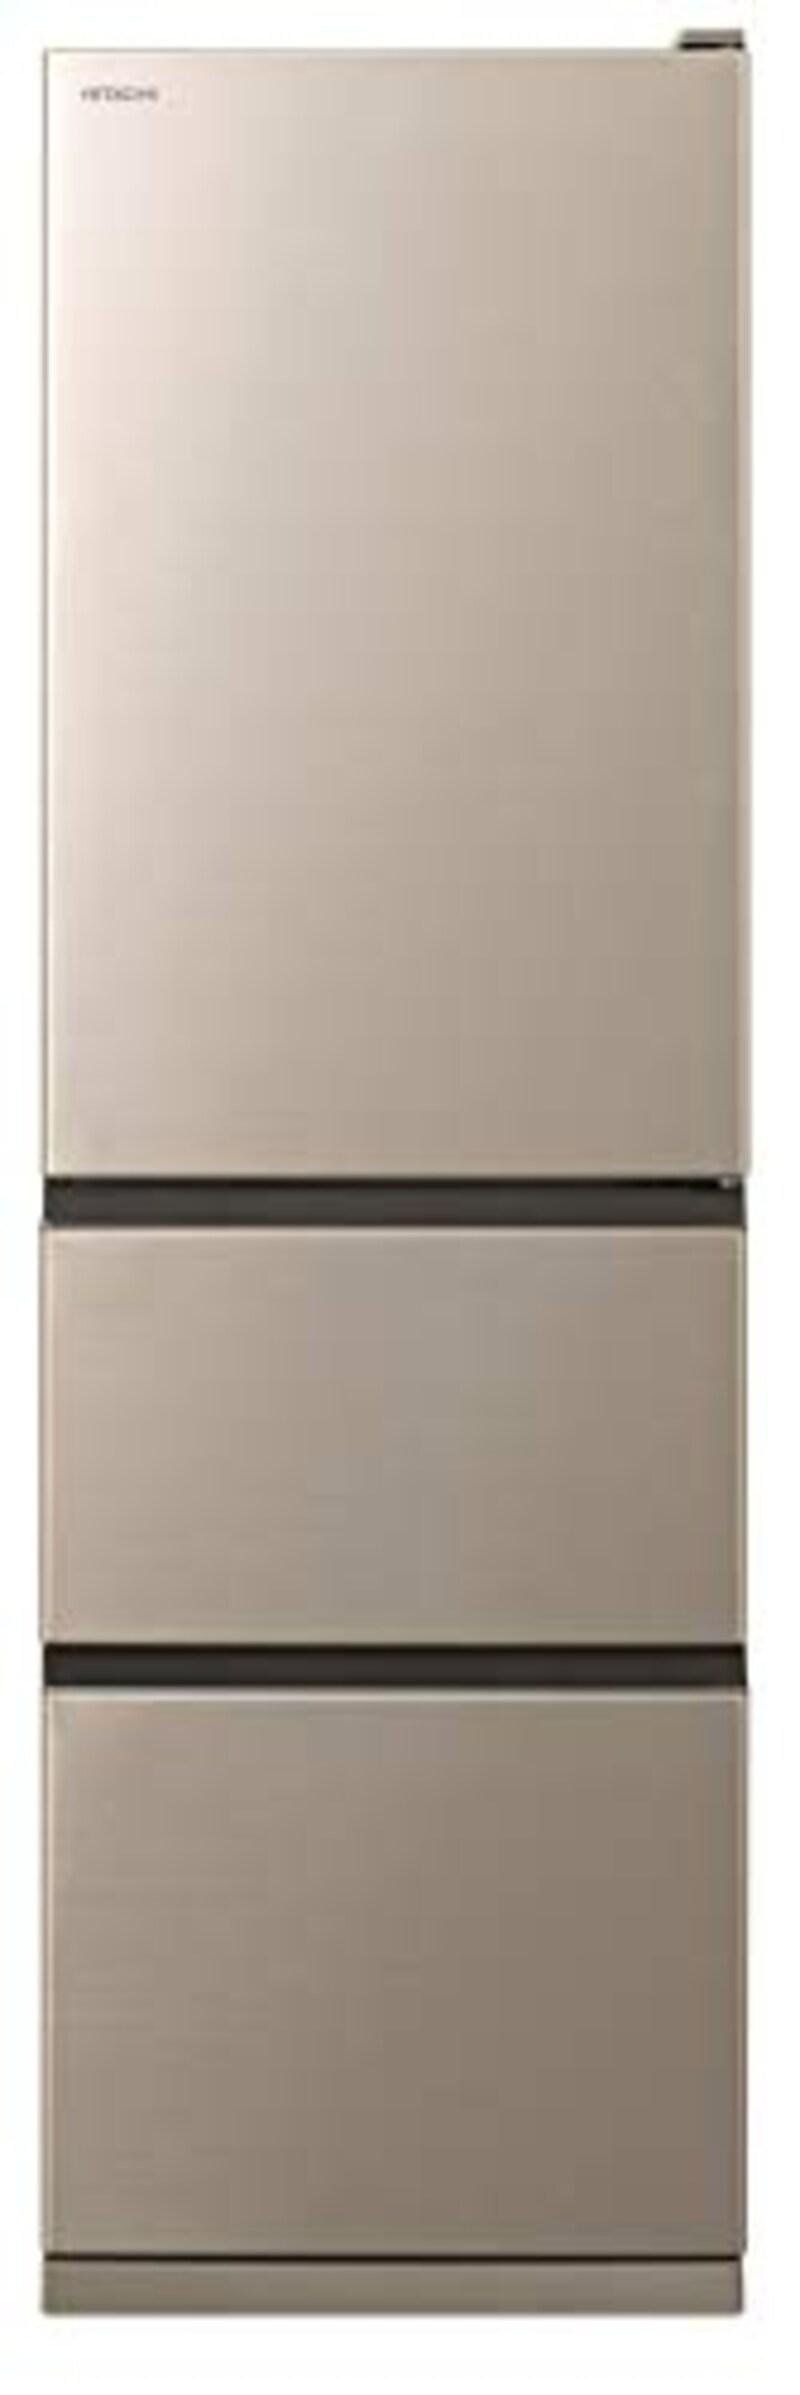 HITACHI(日立),3ドア冷蔵庫 まんなか野菜室シンプルデザイン,R-V32NV